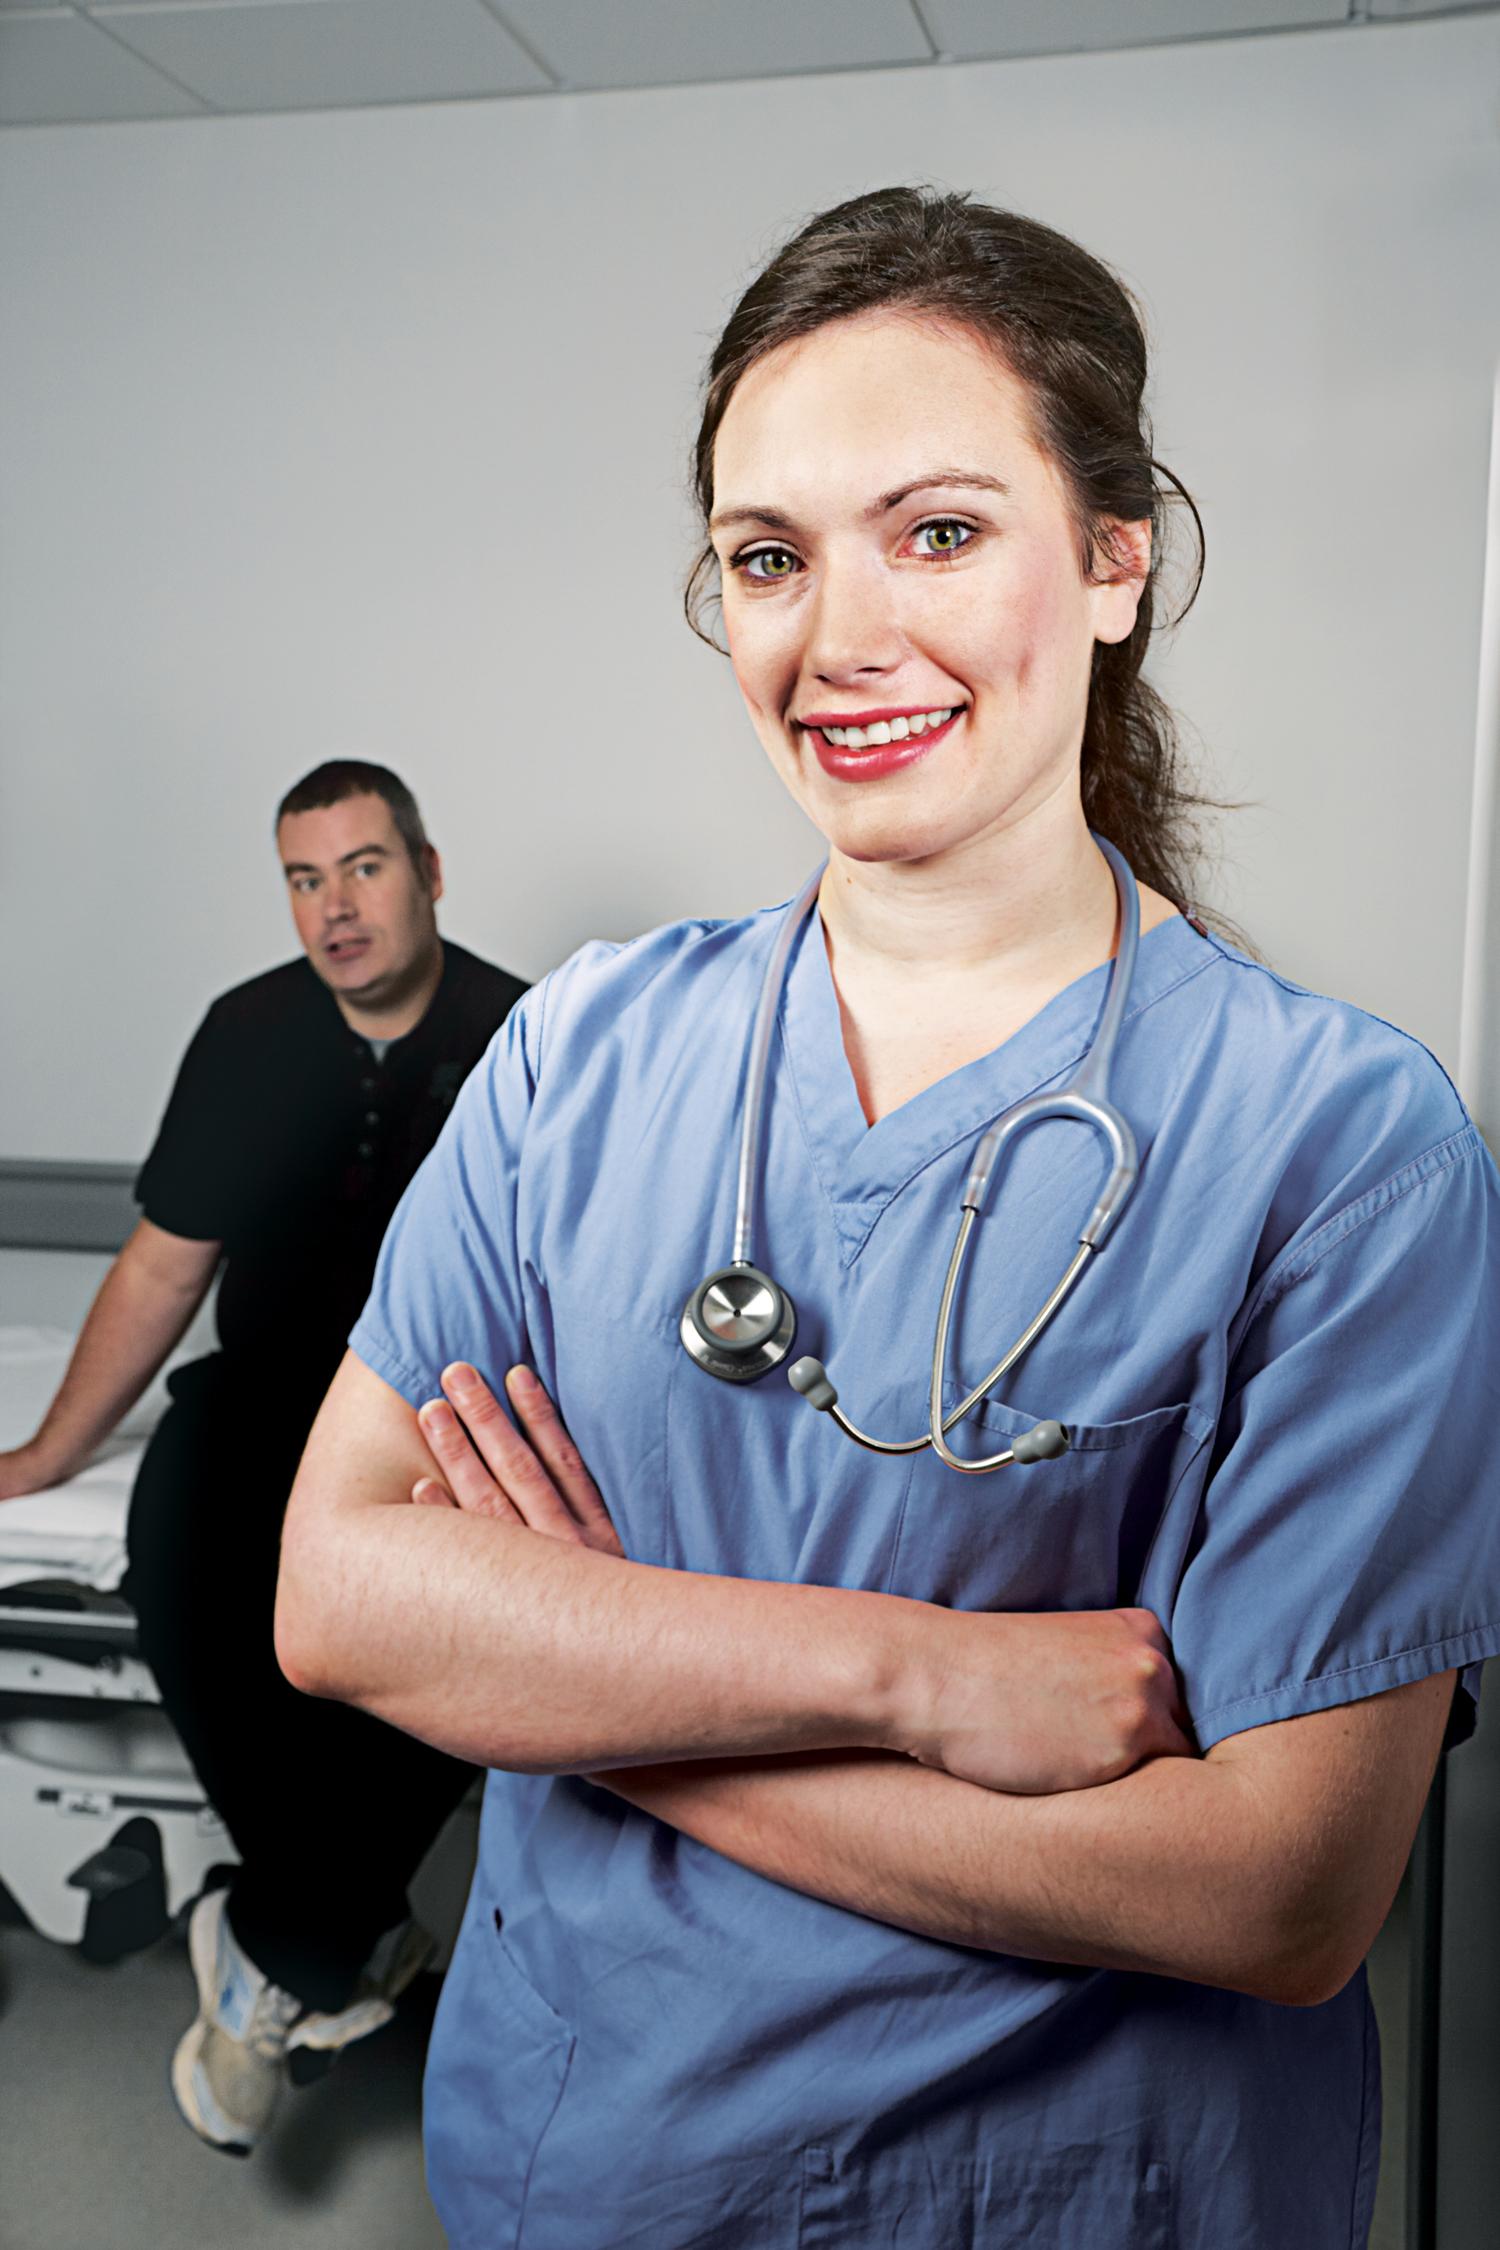 Female Doctor-012_final